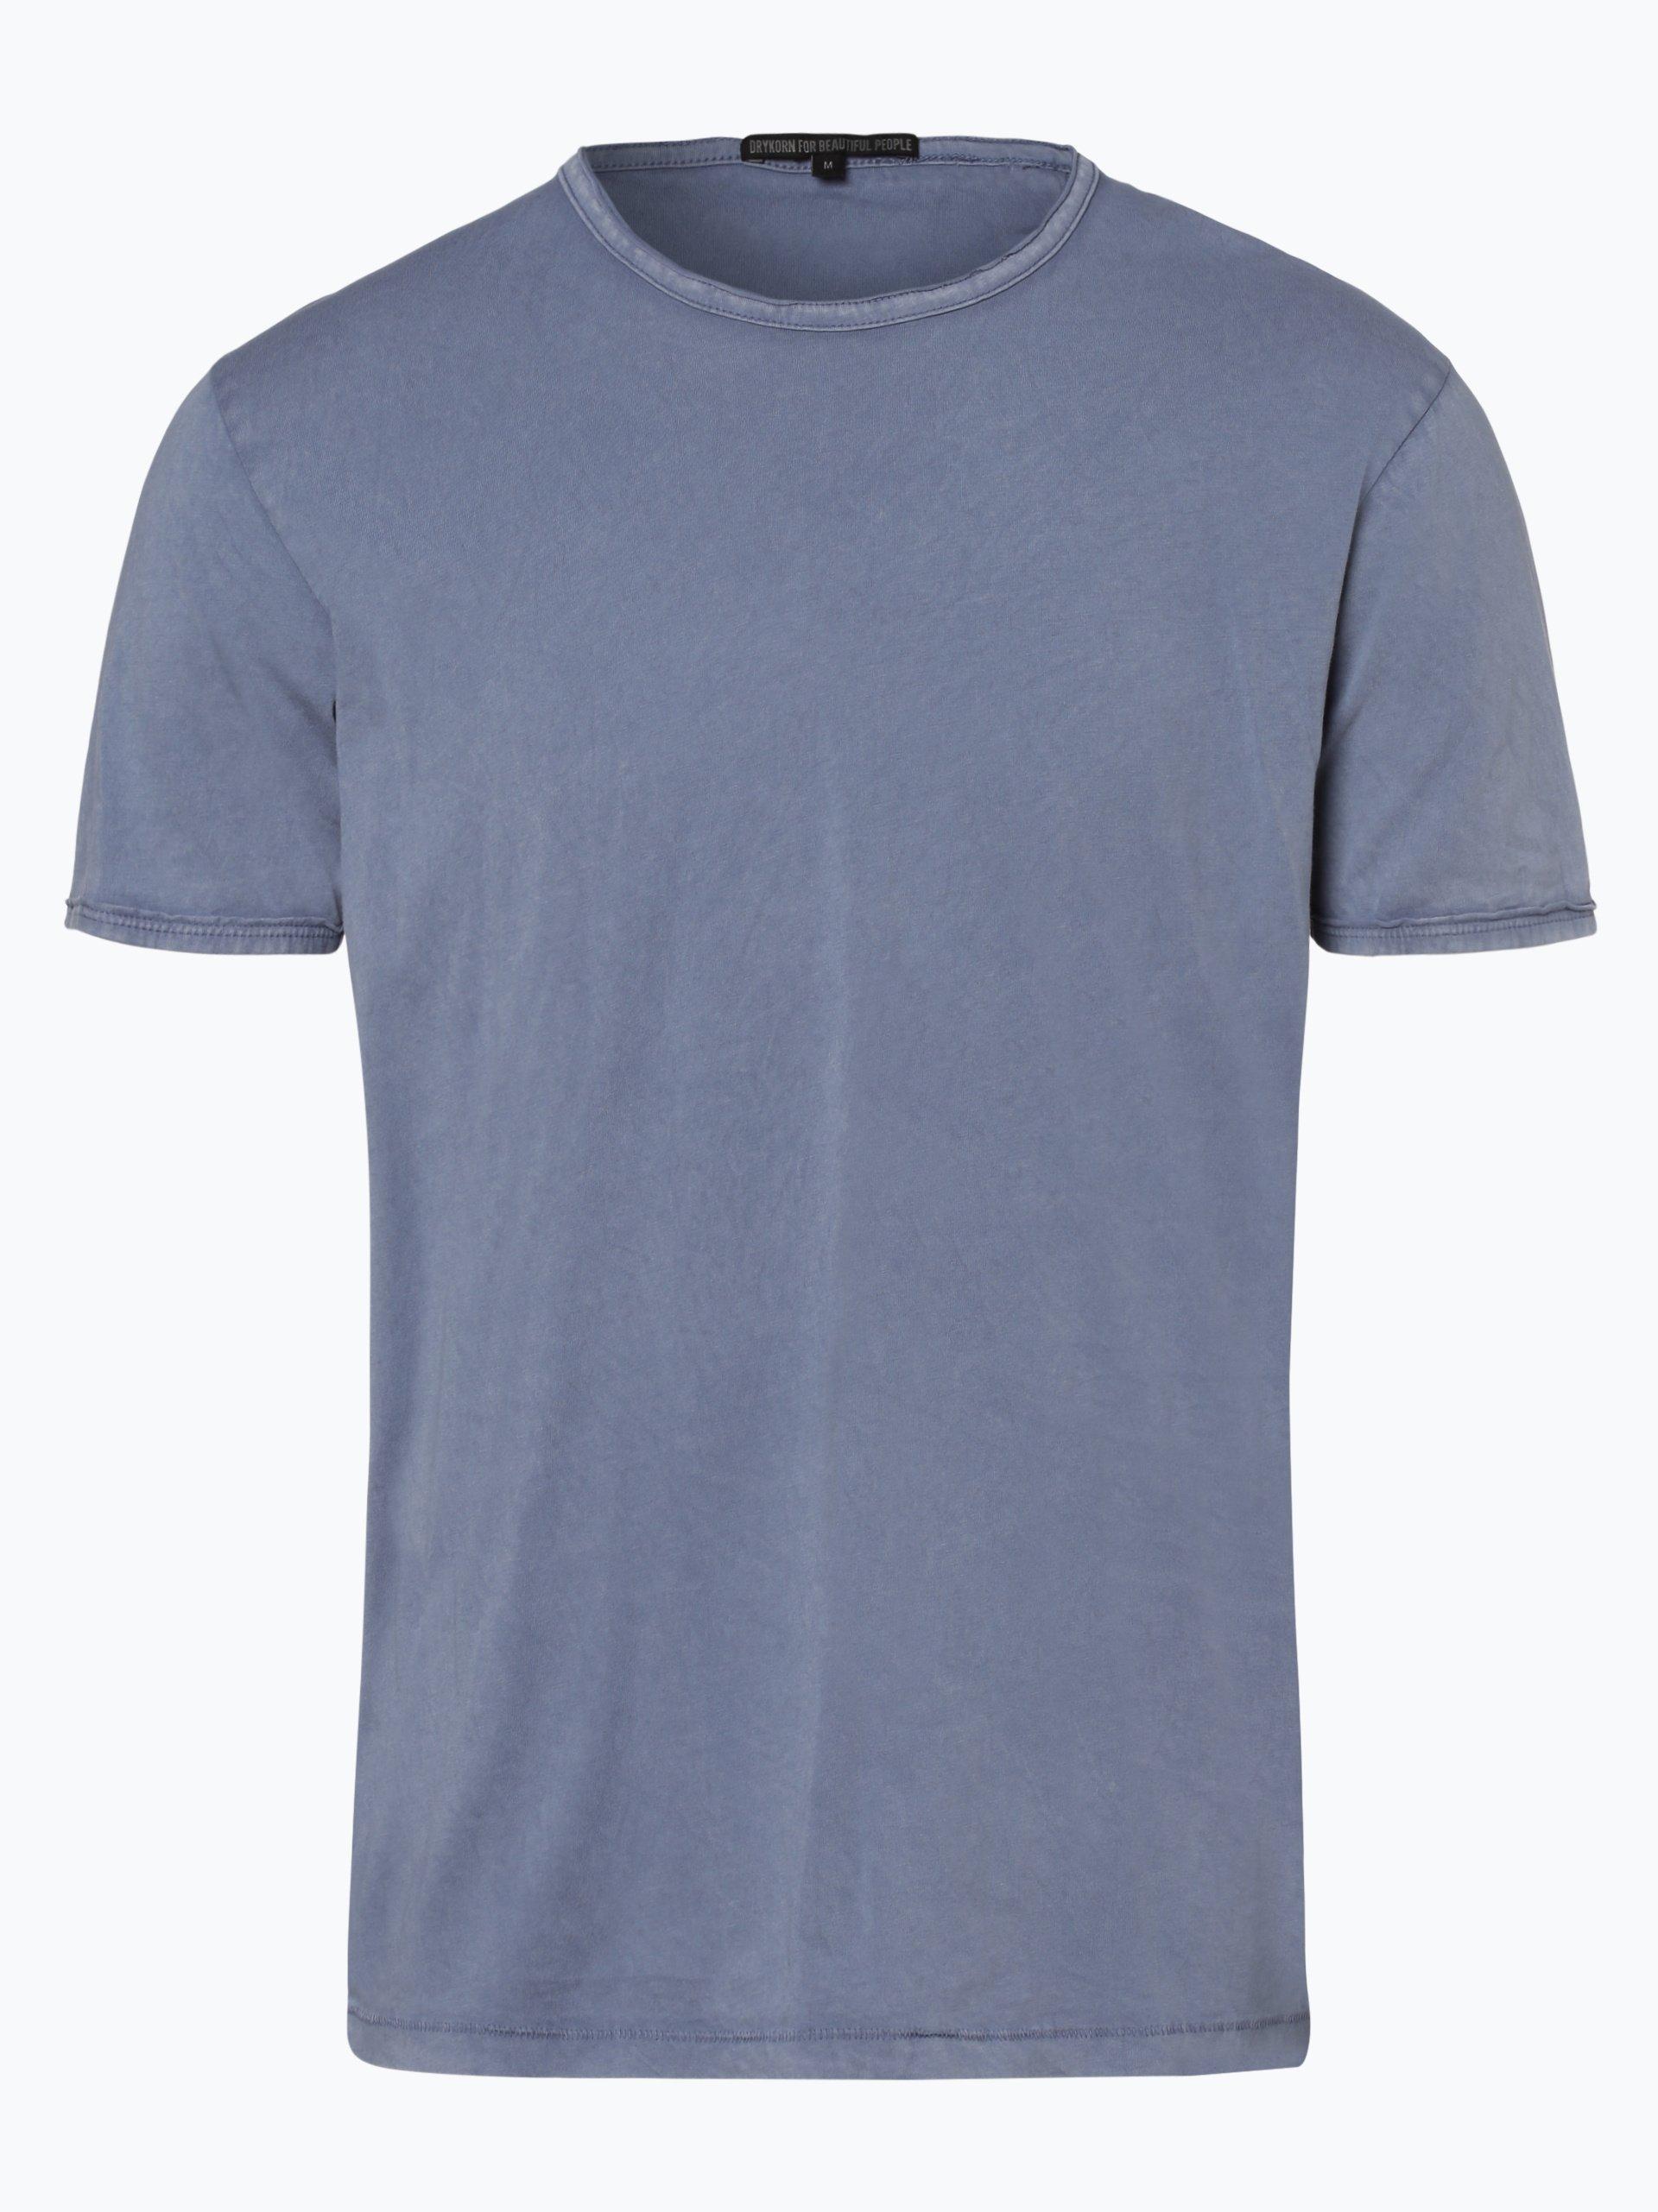 Drykorn Herren T-Shirt - Nero